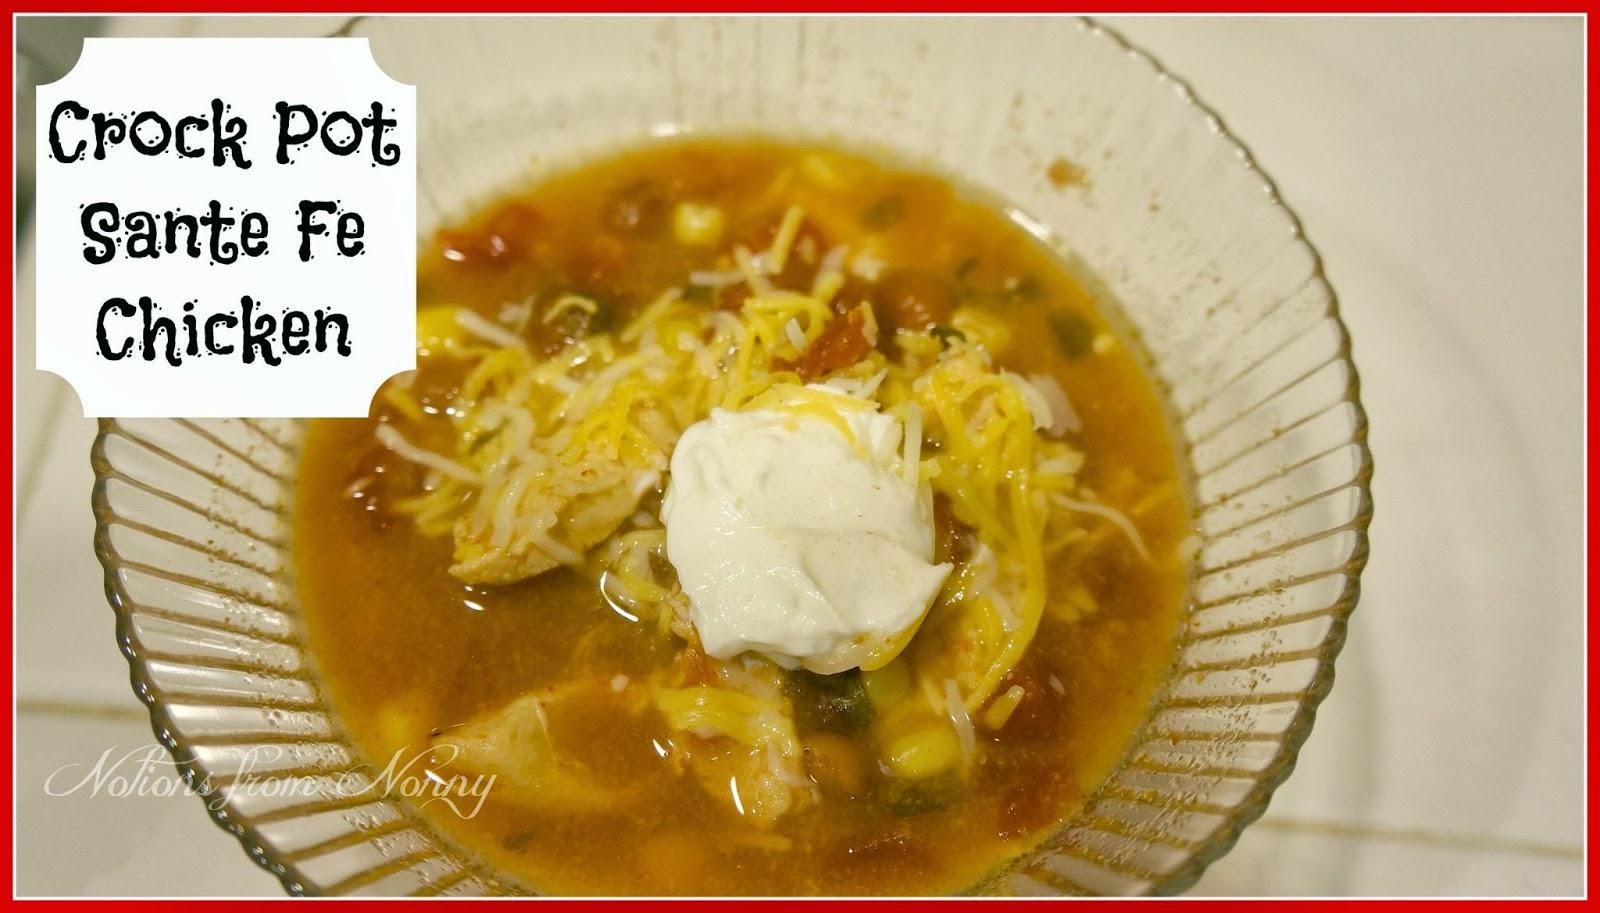 crock pot santa fe chicken servings 8 servings size 1 cup old points 3 ...